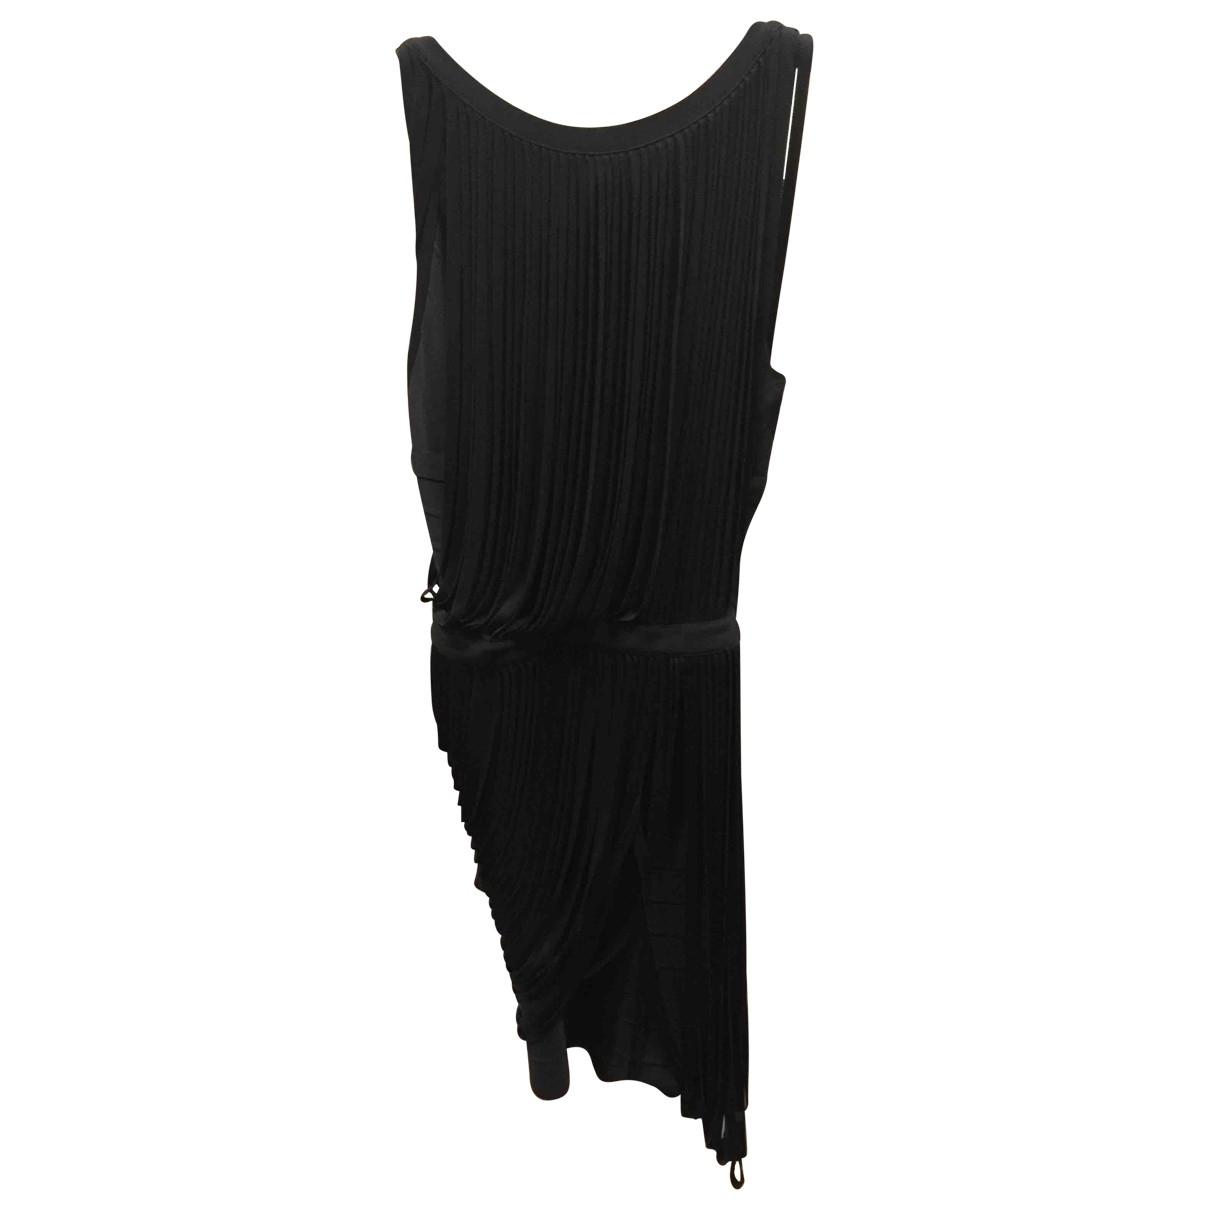 Herve Leger \N Black dress for Women XS International